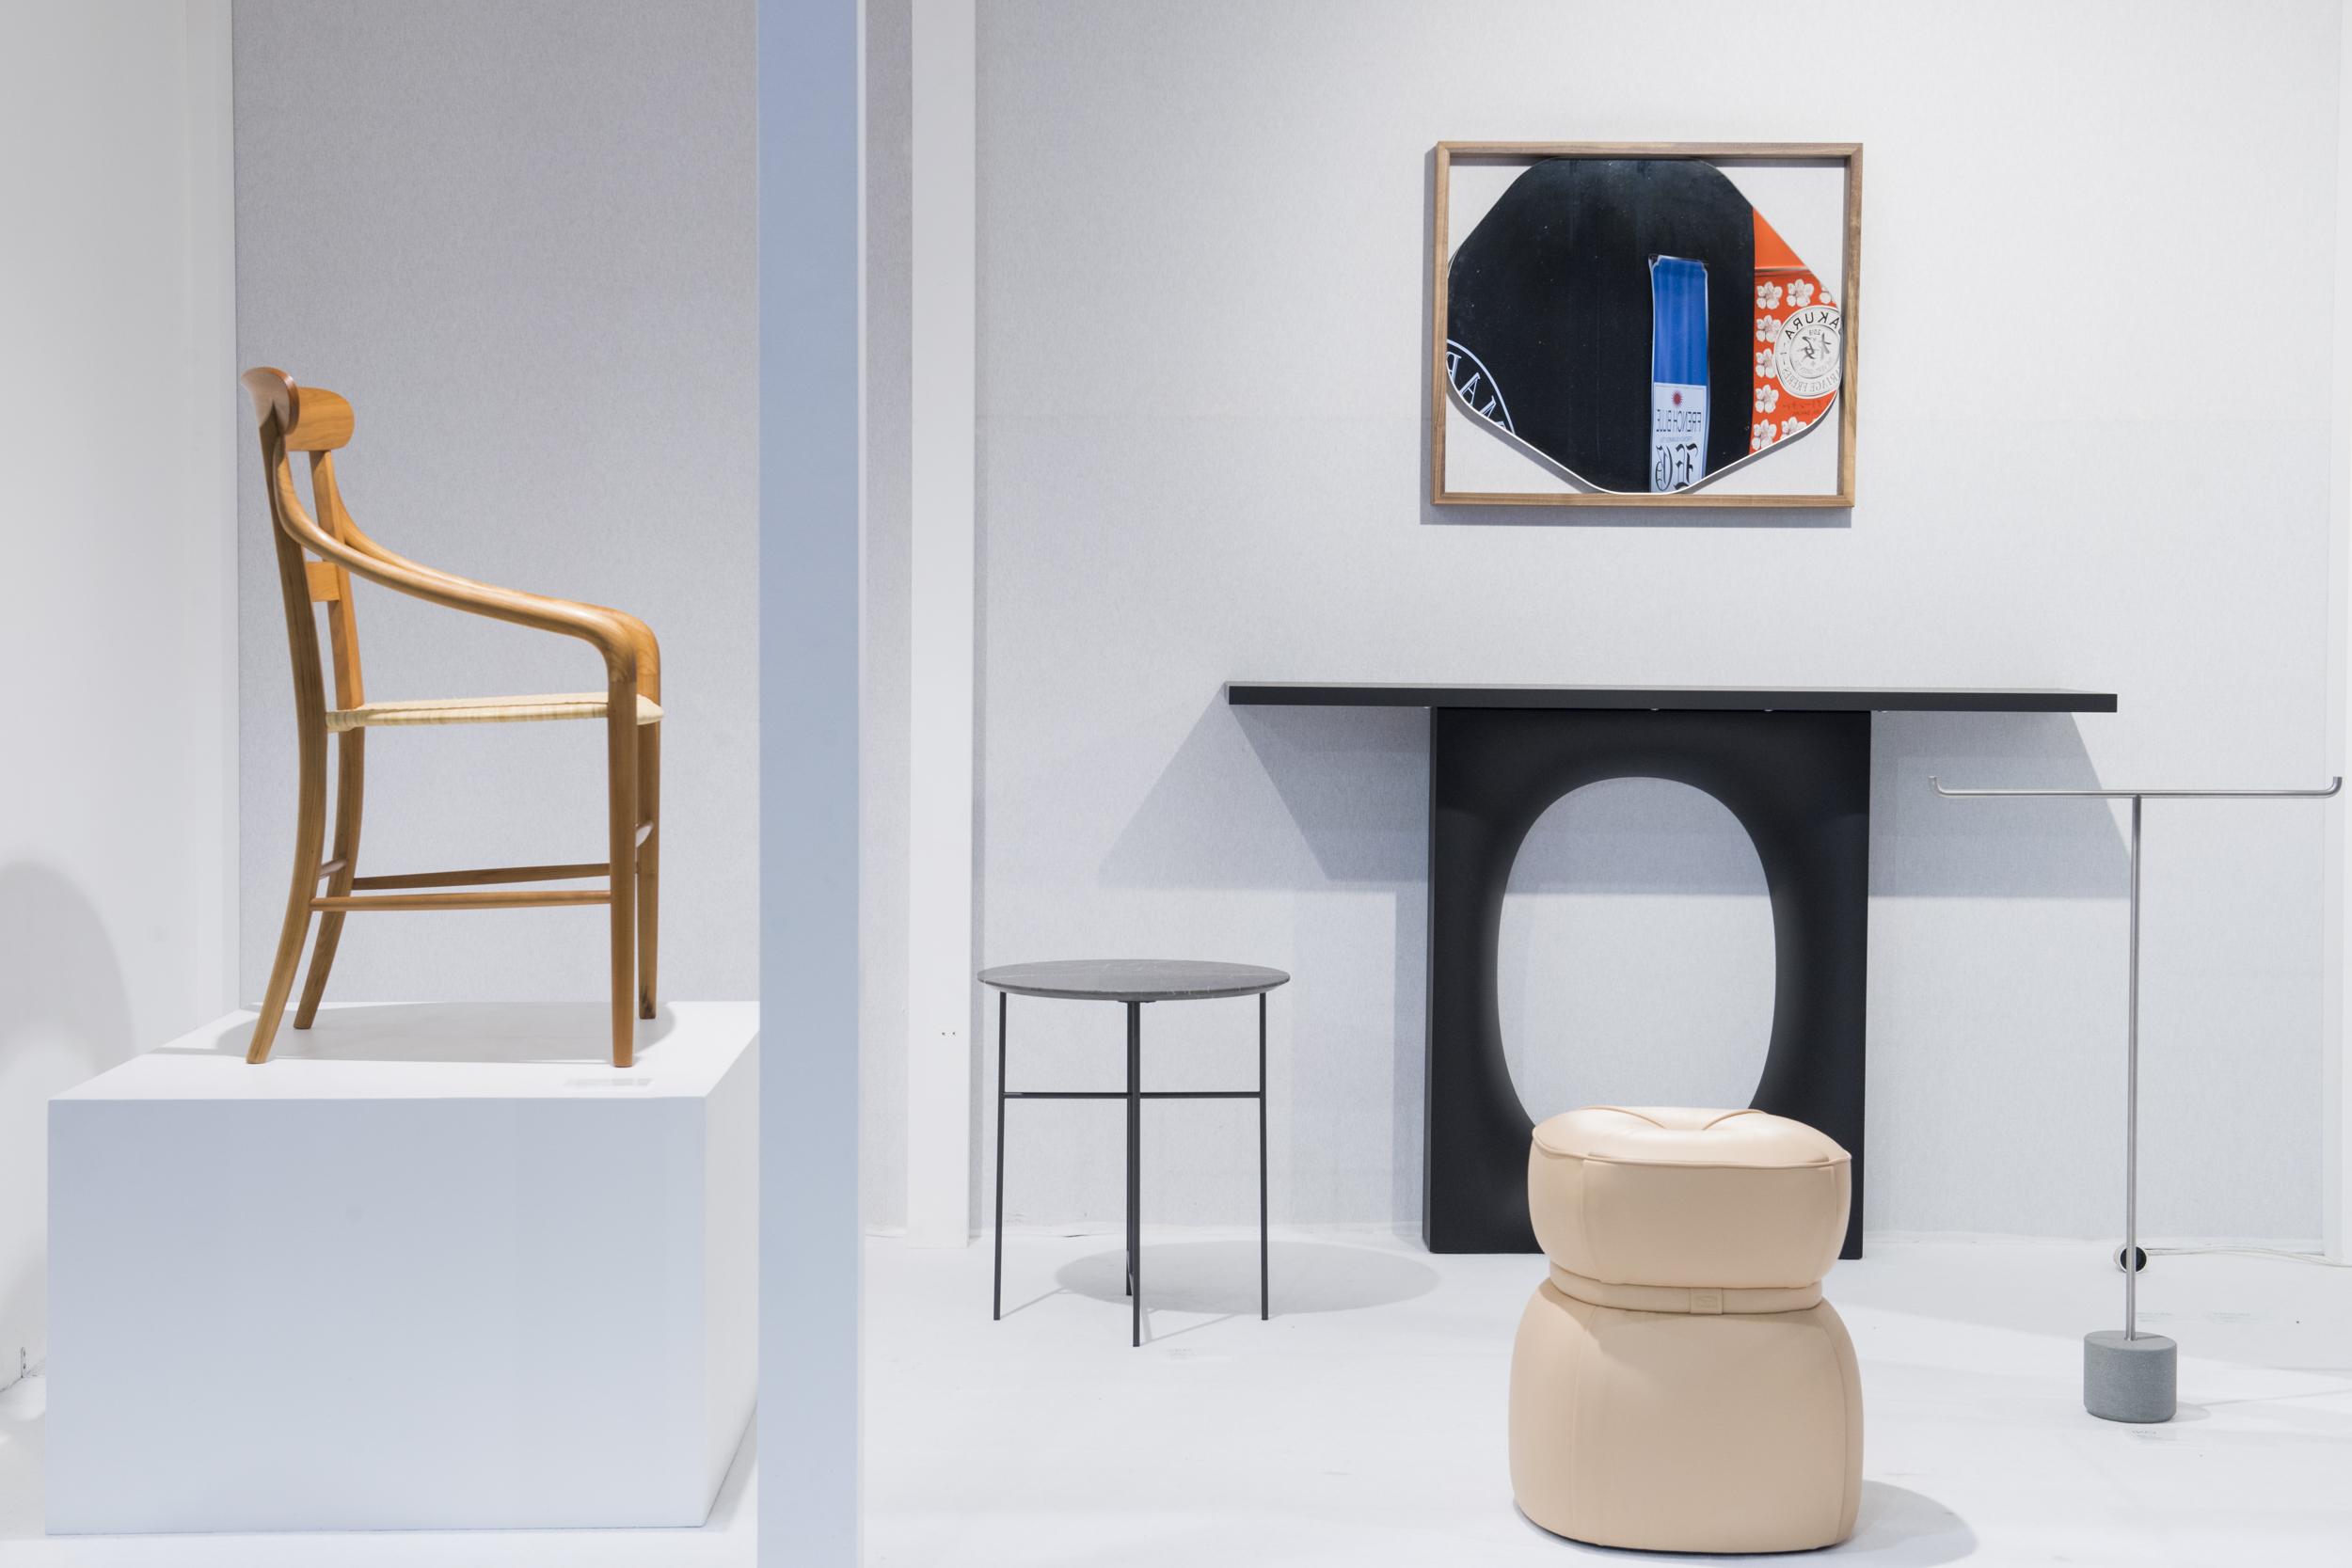 Kensaku Oshiro stand at Maison&Objet, hall 7, January 2018 with  Chivari  chair,  Leply  pouf,  Sen  table and  Holo  console ©  Maison&Objet